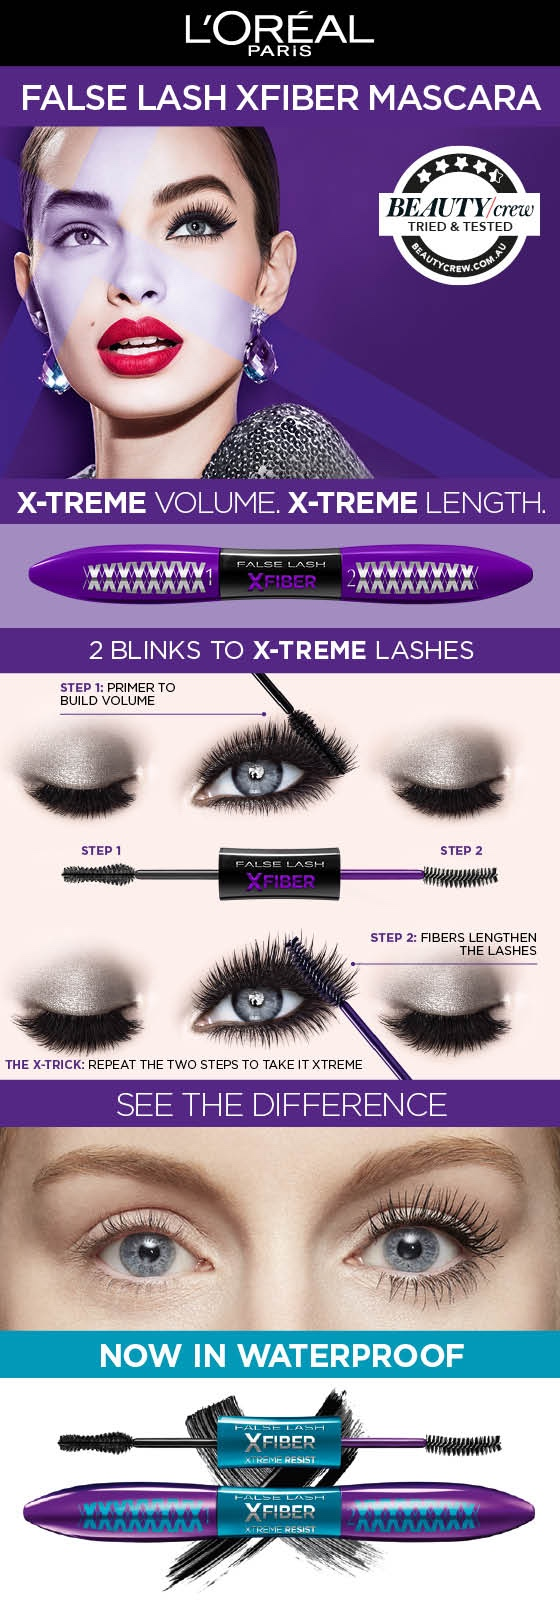 81387b3d1dd Buy L'Oreal False Lash X-Fiber Mascara Black Online at Chemist ...